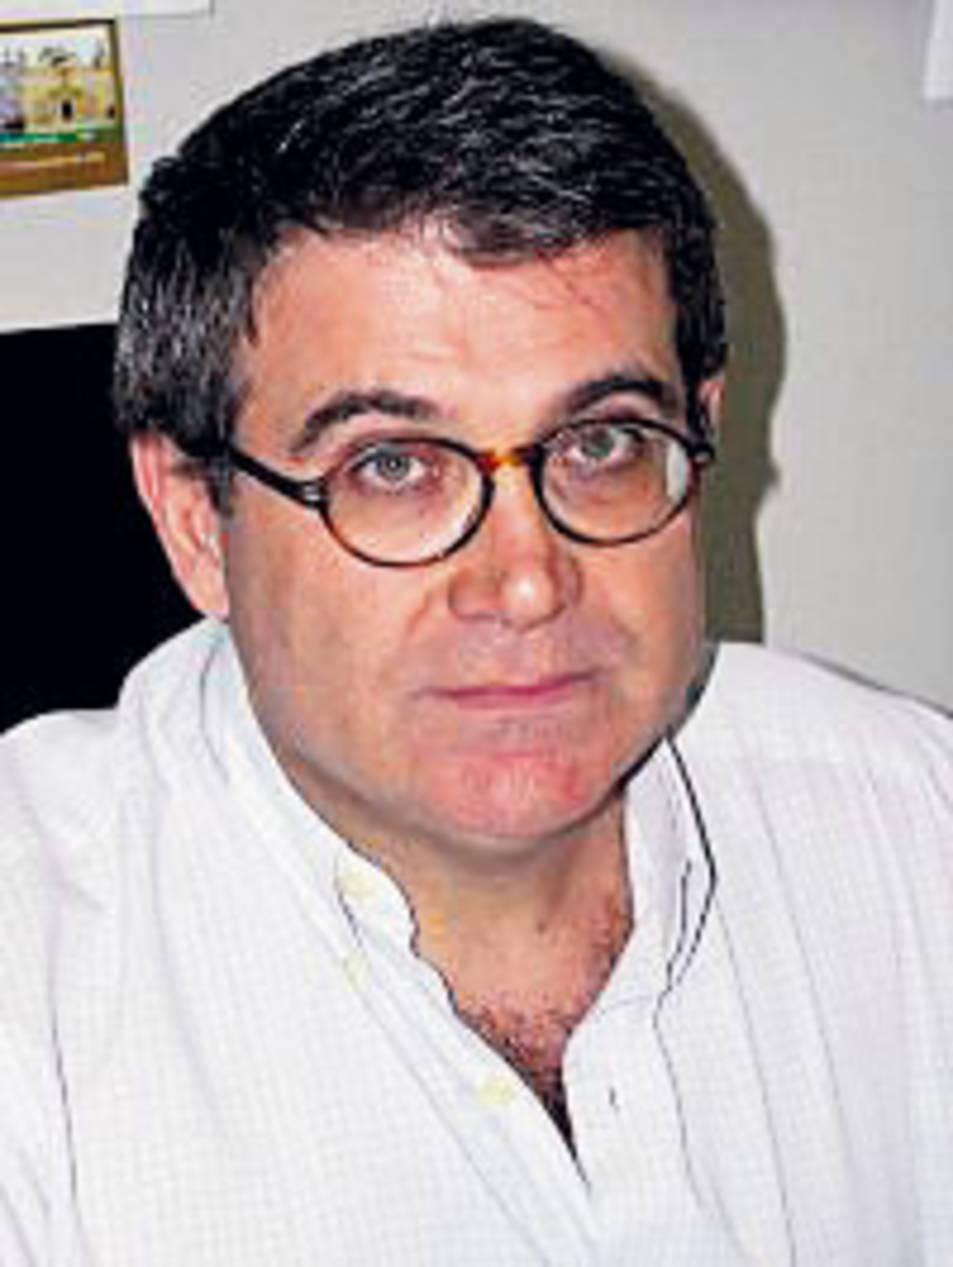 Jaume Massó Carballido